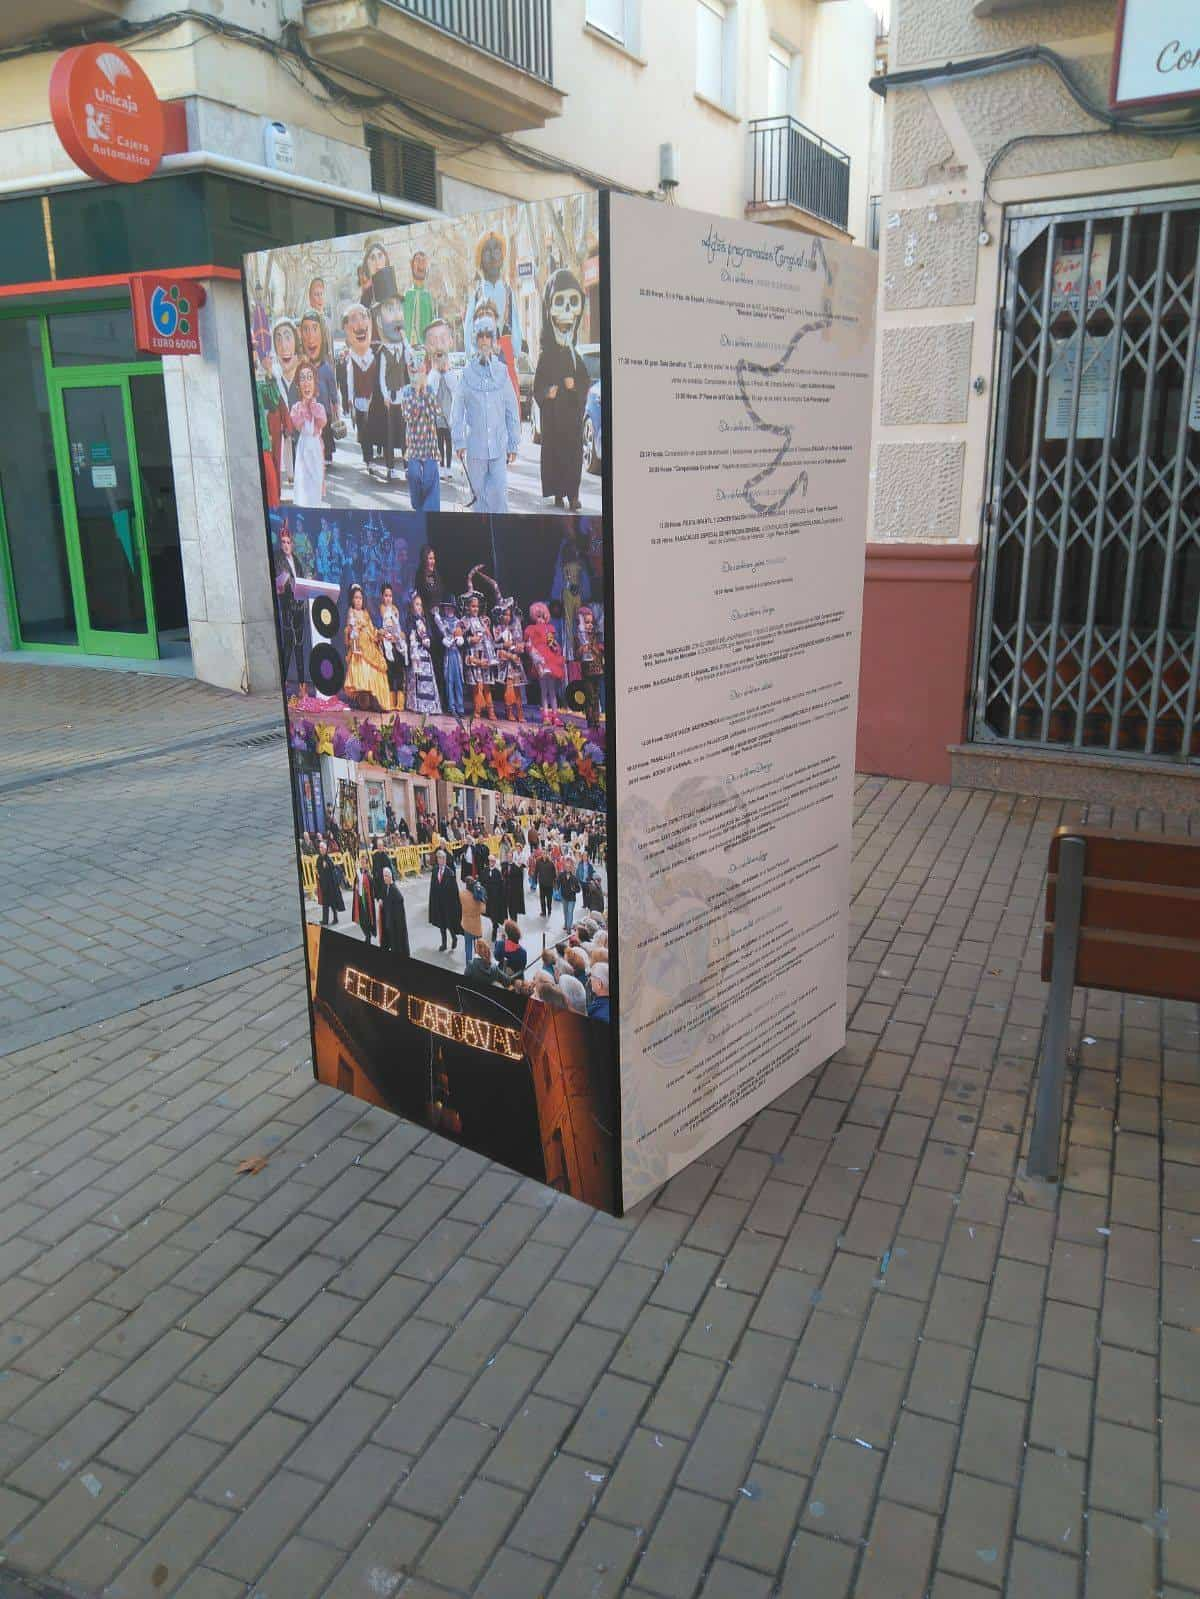 paneles informativos carnaval 2018 calle - Paneles informativos del Carnaval 2018 a pie de calle